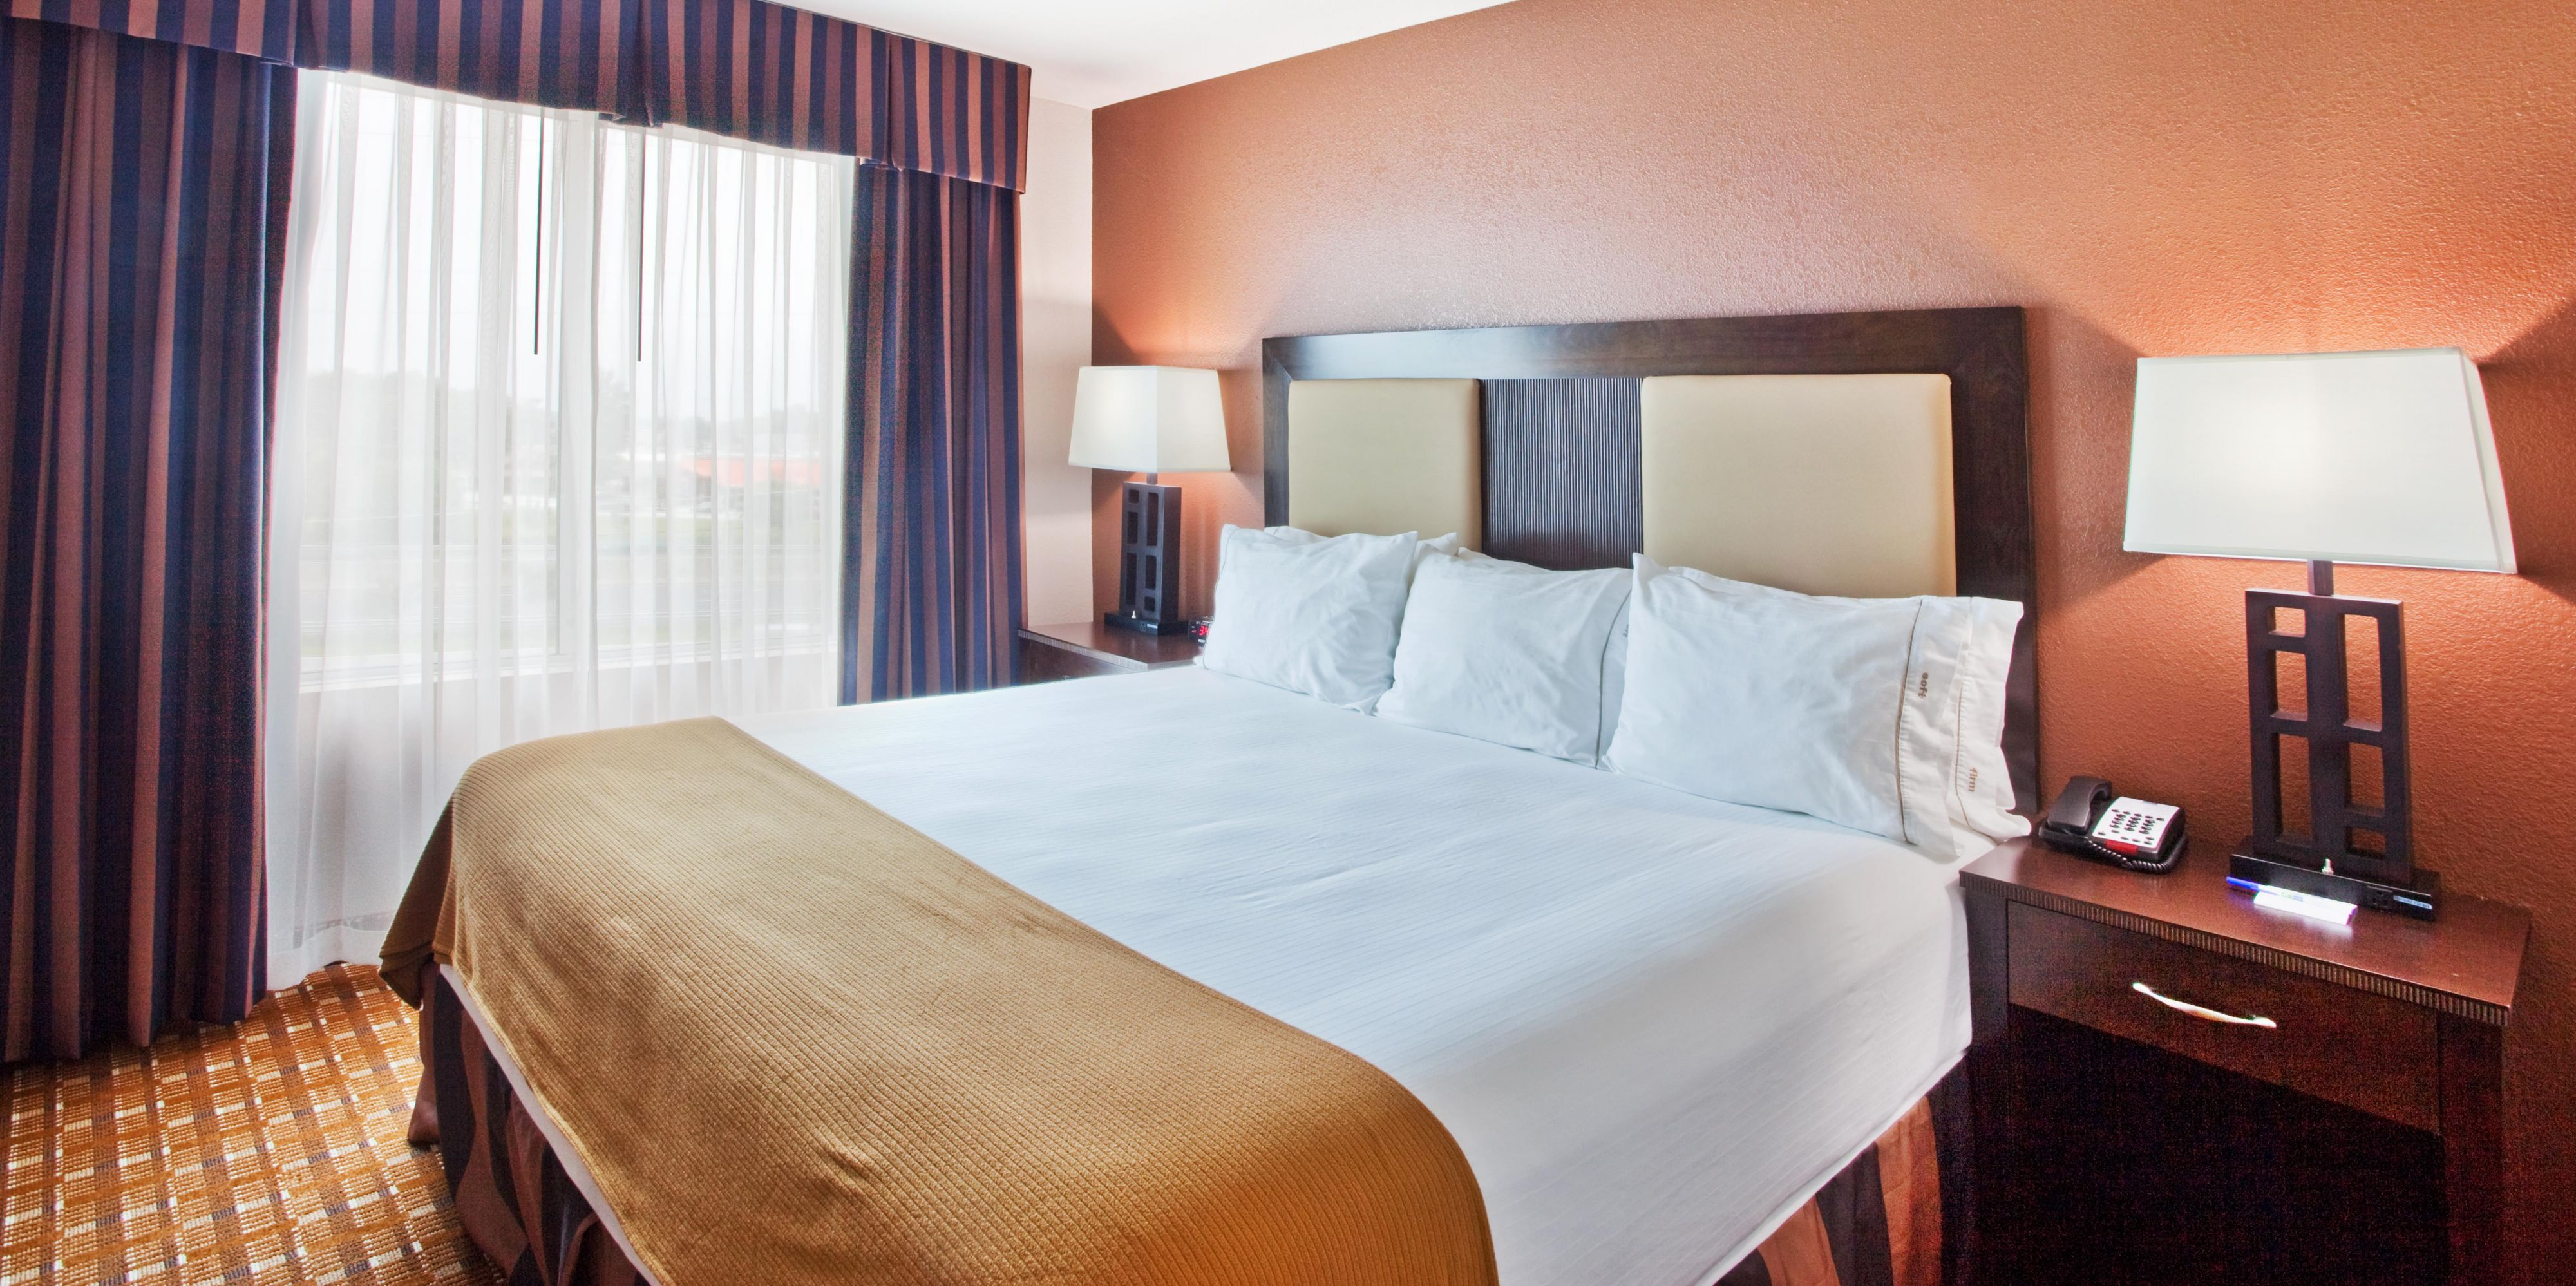 Hotel in Conyers GA near Atlanta Holiday Inn Express